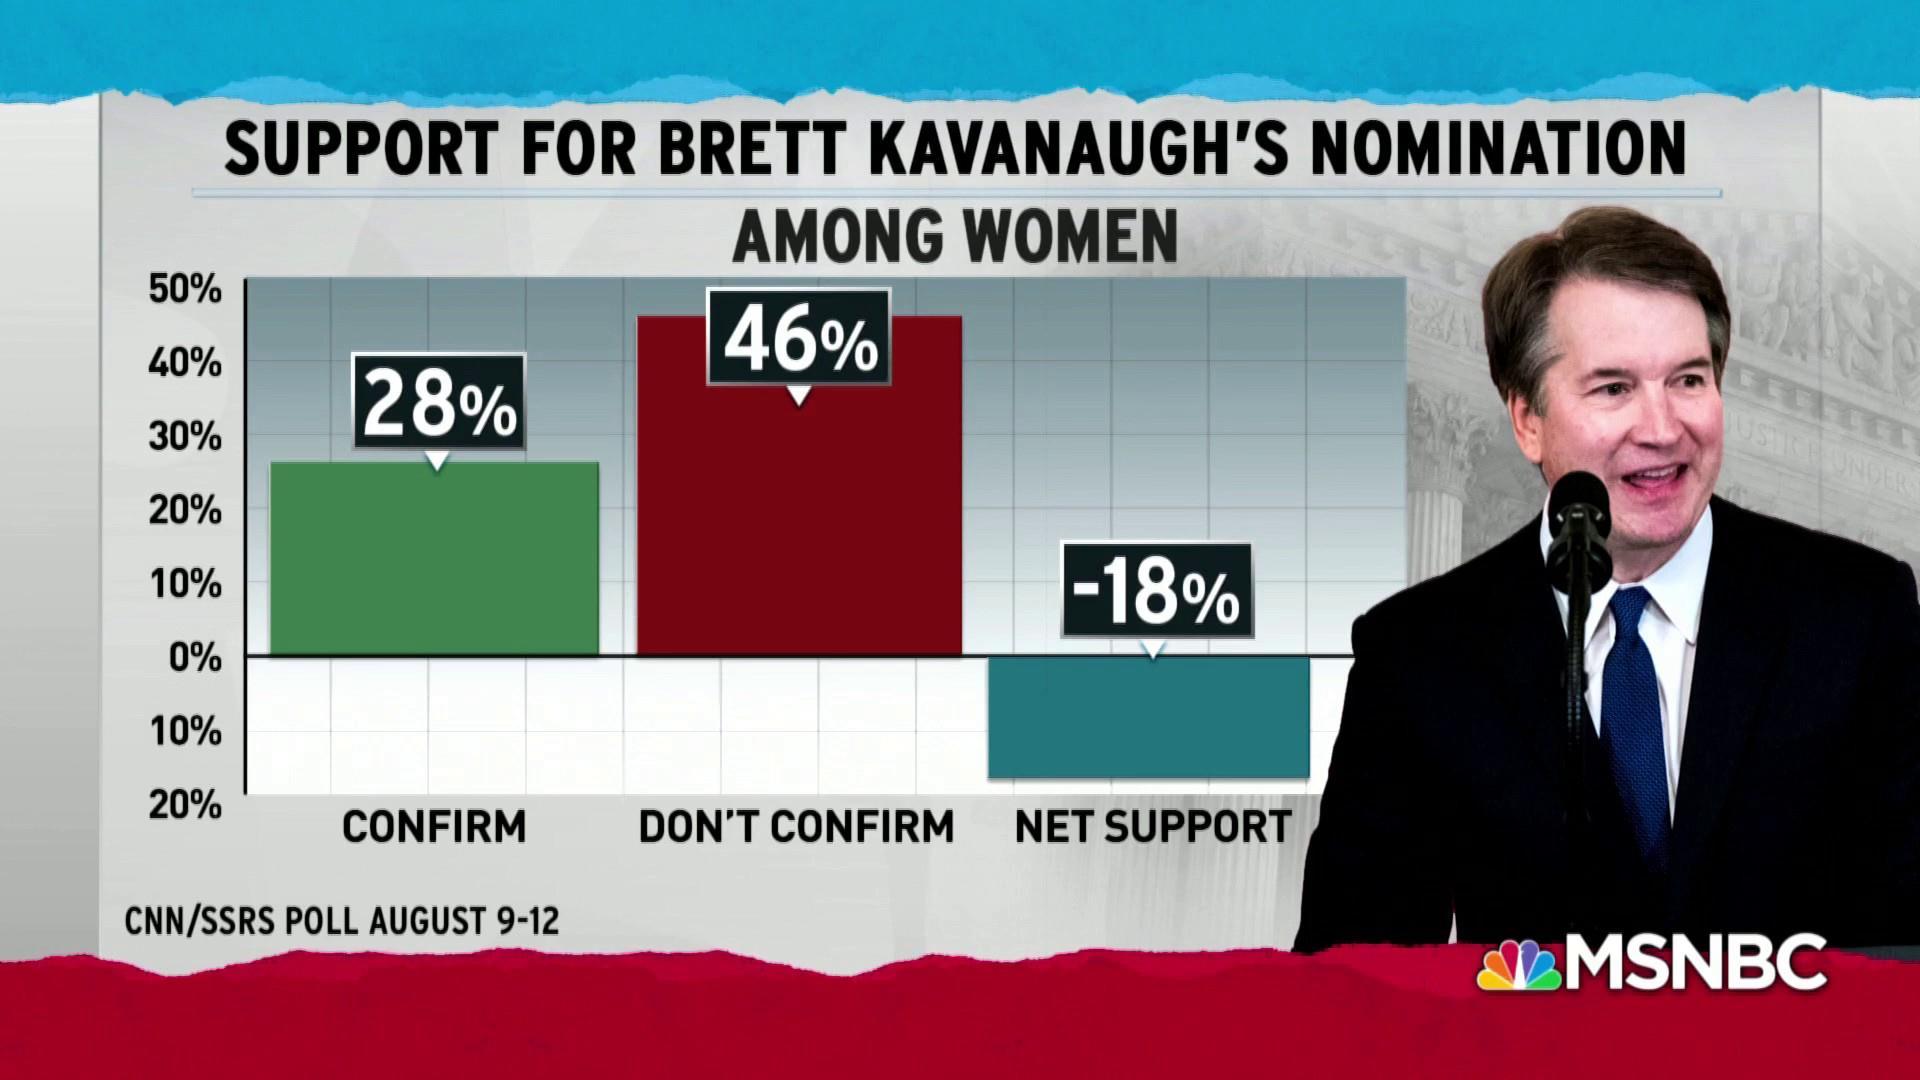 U.S. women see reason to reject Trump SCOTUS pick Brett Kavanaugh